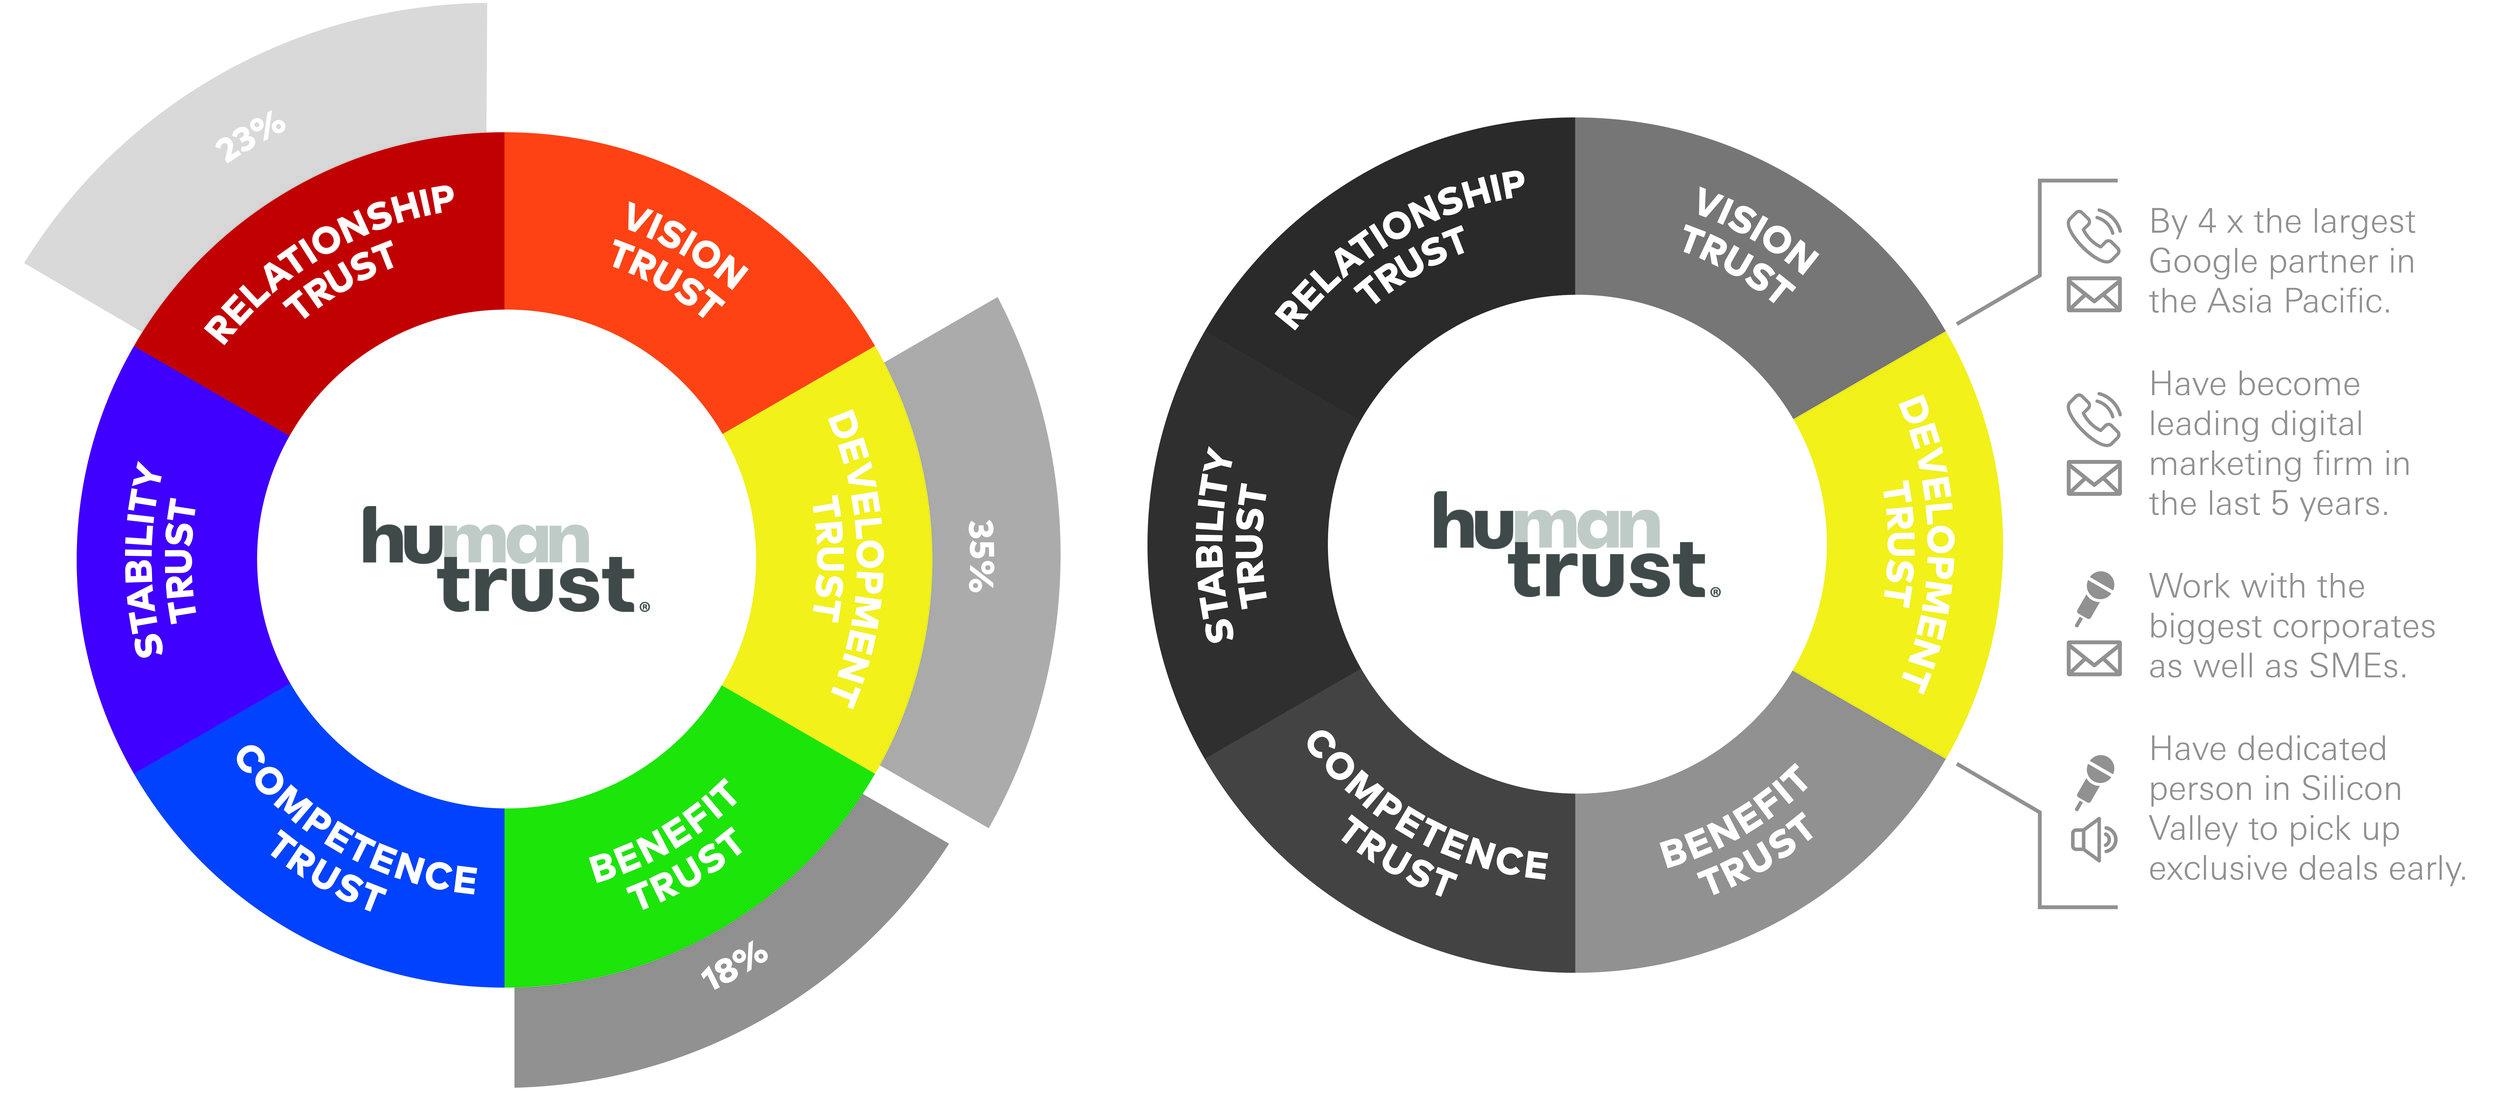 Mext_Consulting_Firm_Melbourne_Trust_HuTrust_Model_Human_Trust_Attributes_Focus.jpg